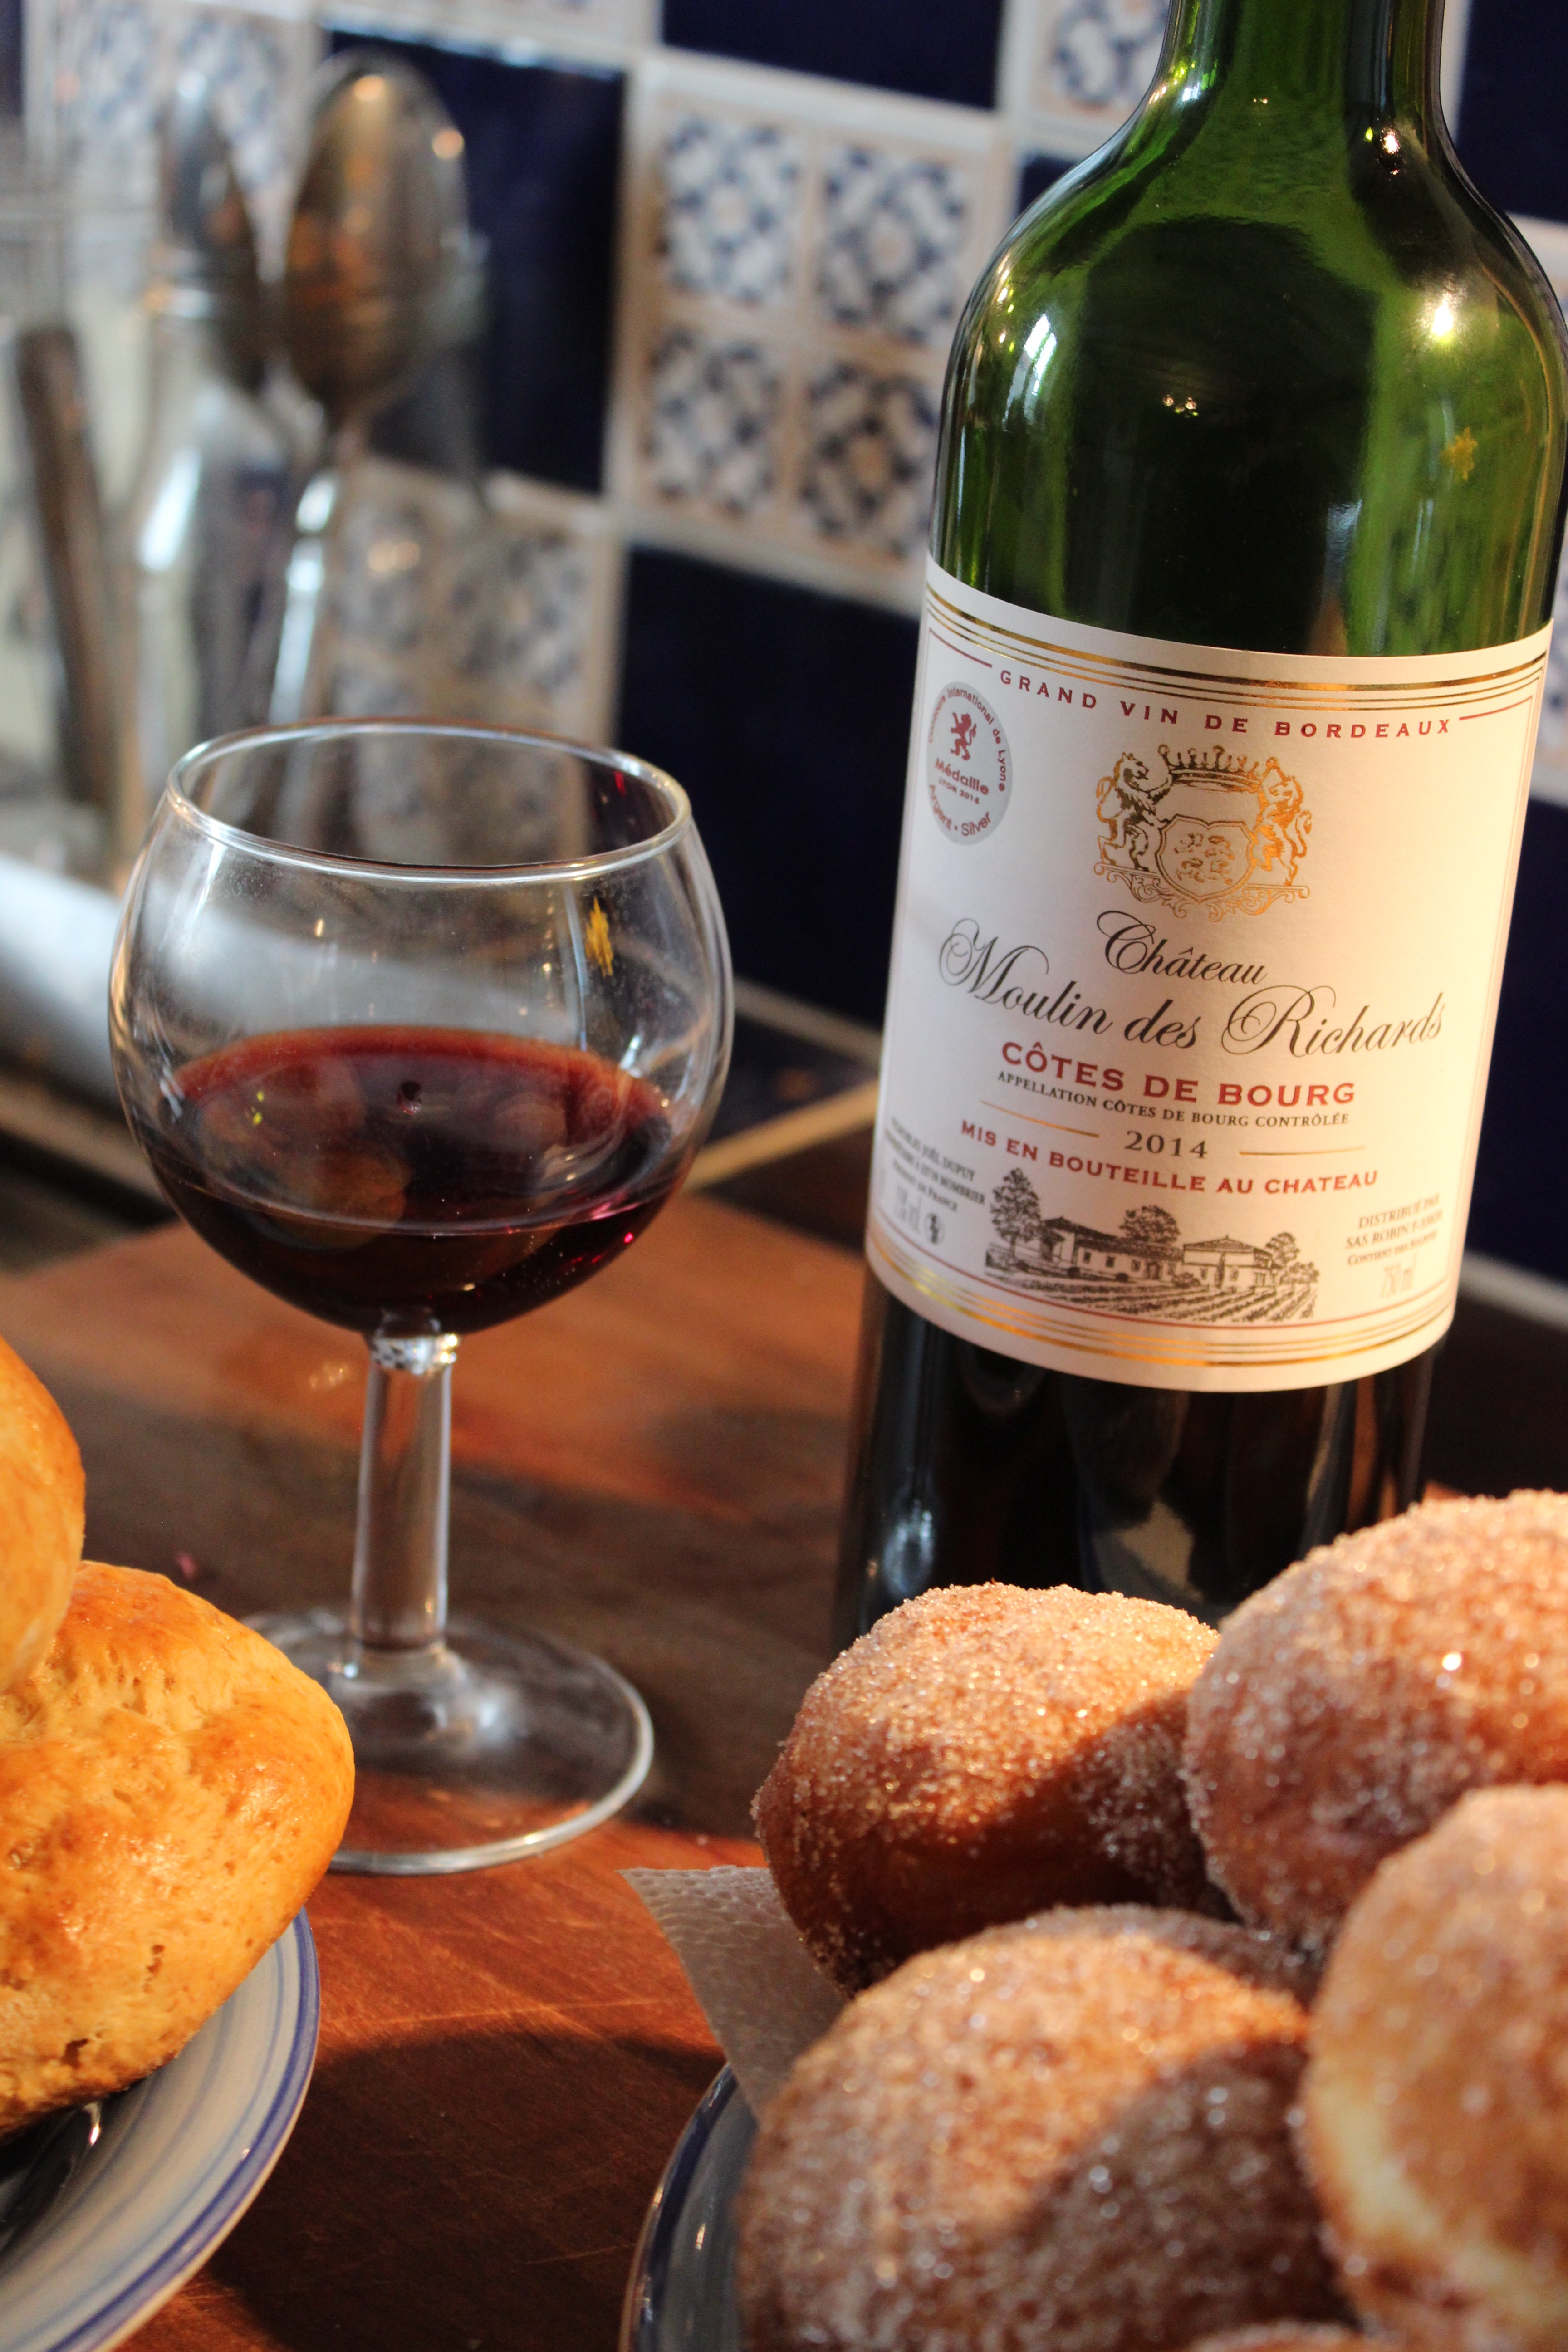 Donuts & wine